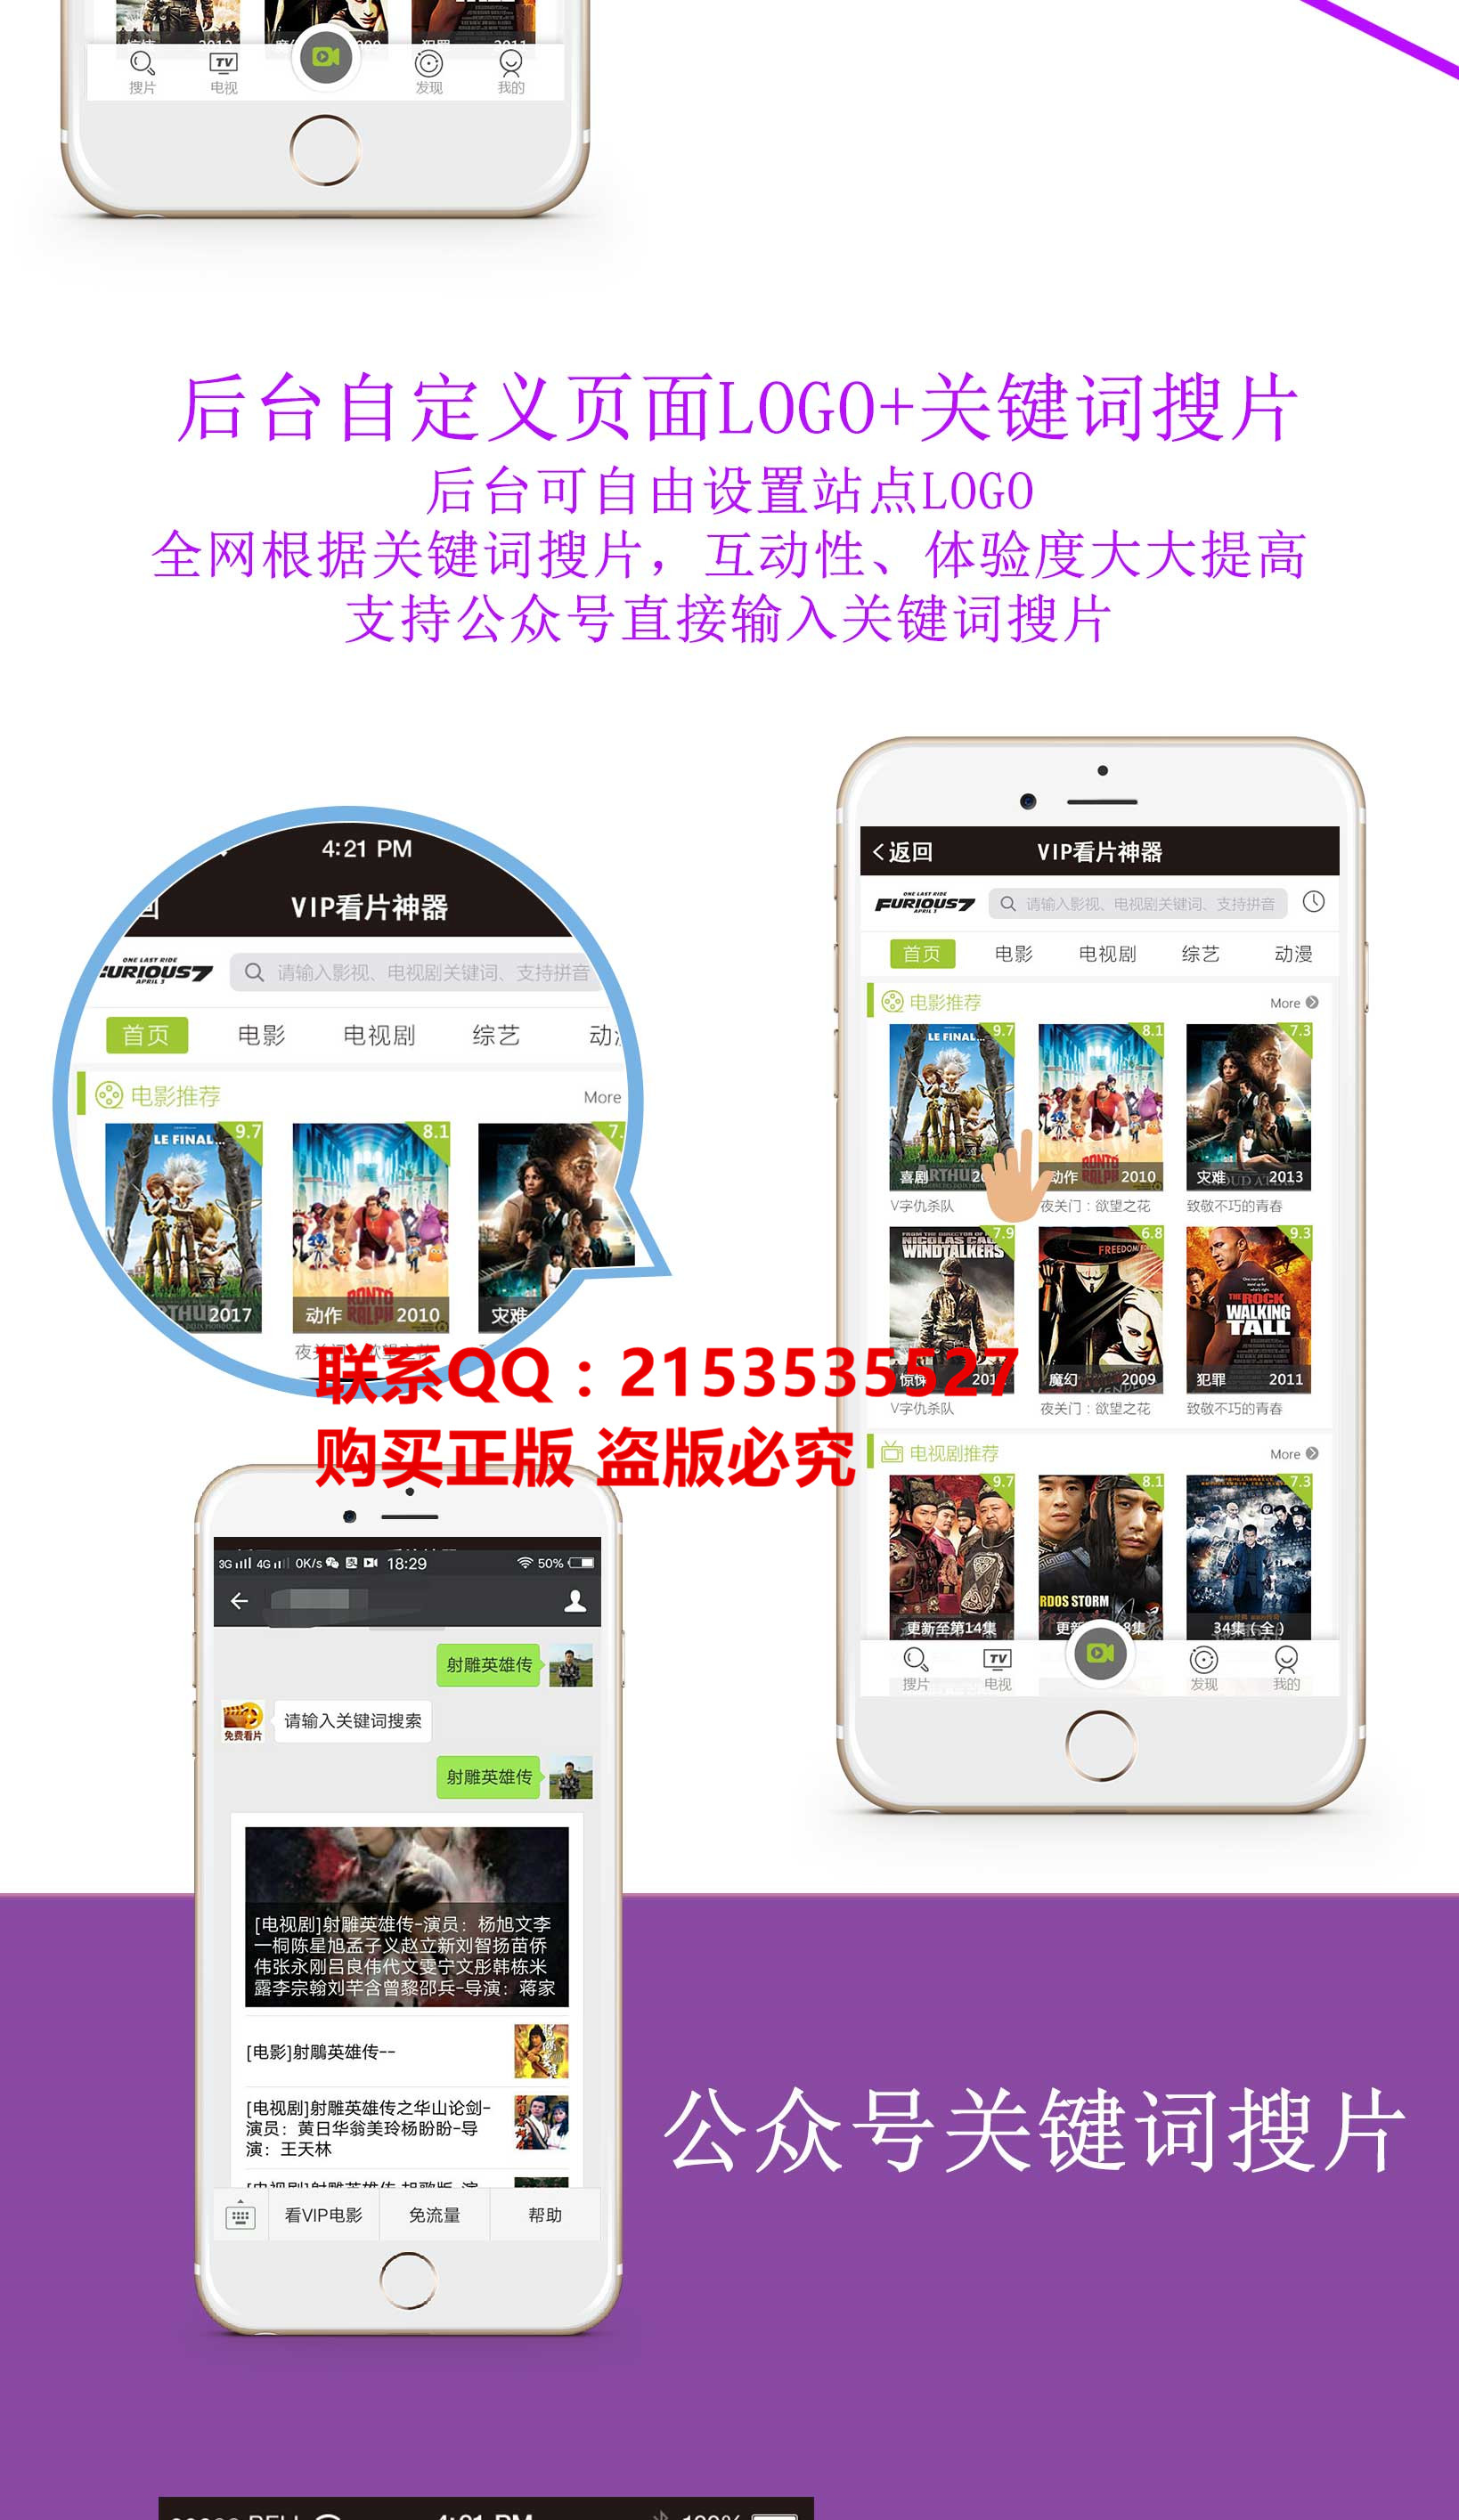 wq模块VIP视频电影建站cms 5.0.7 原版 公众号模块 第1张